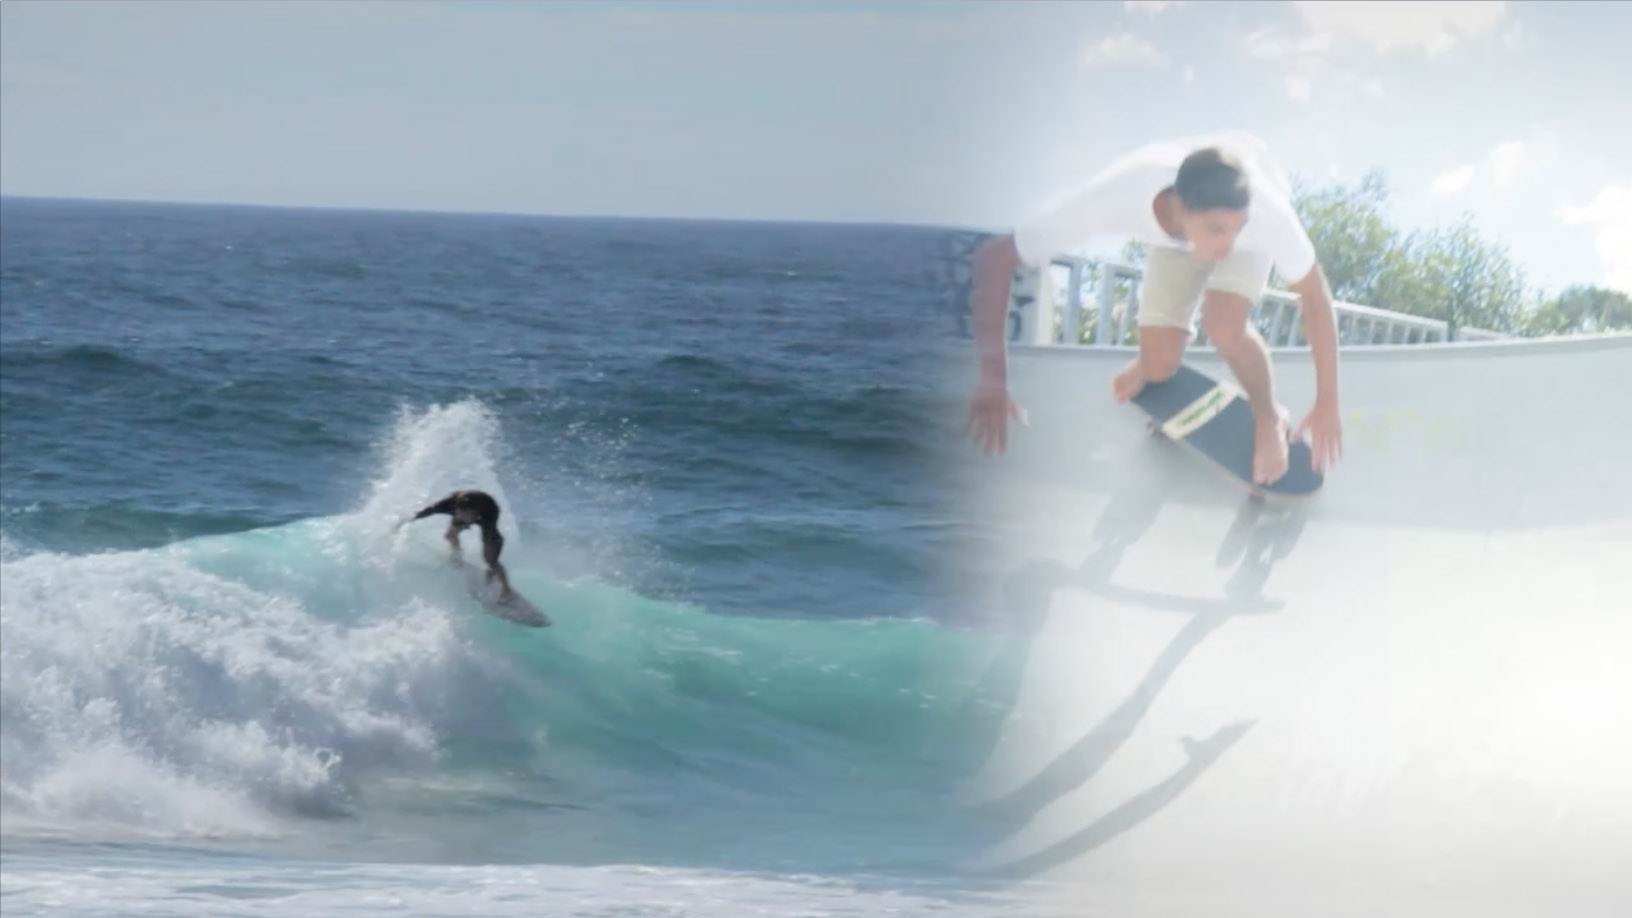 surf-skate-smoothstar-1